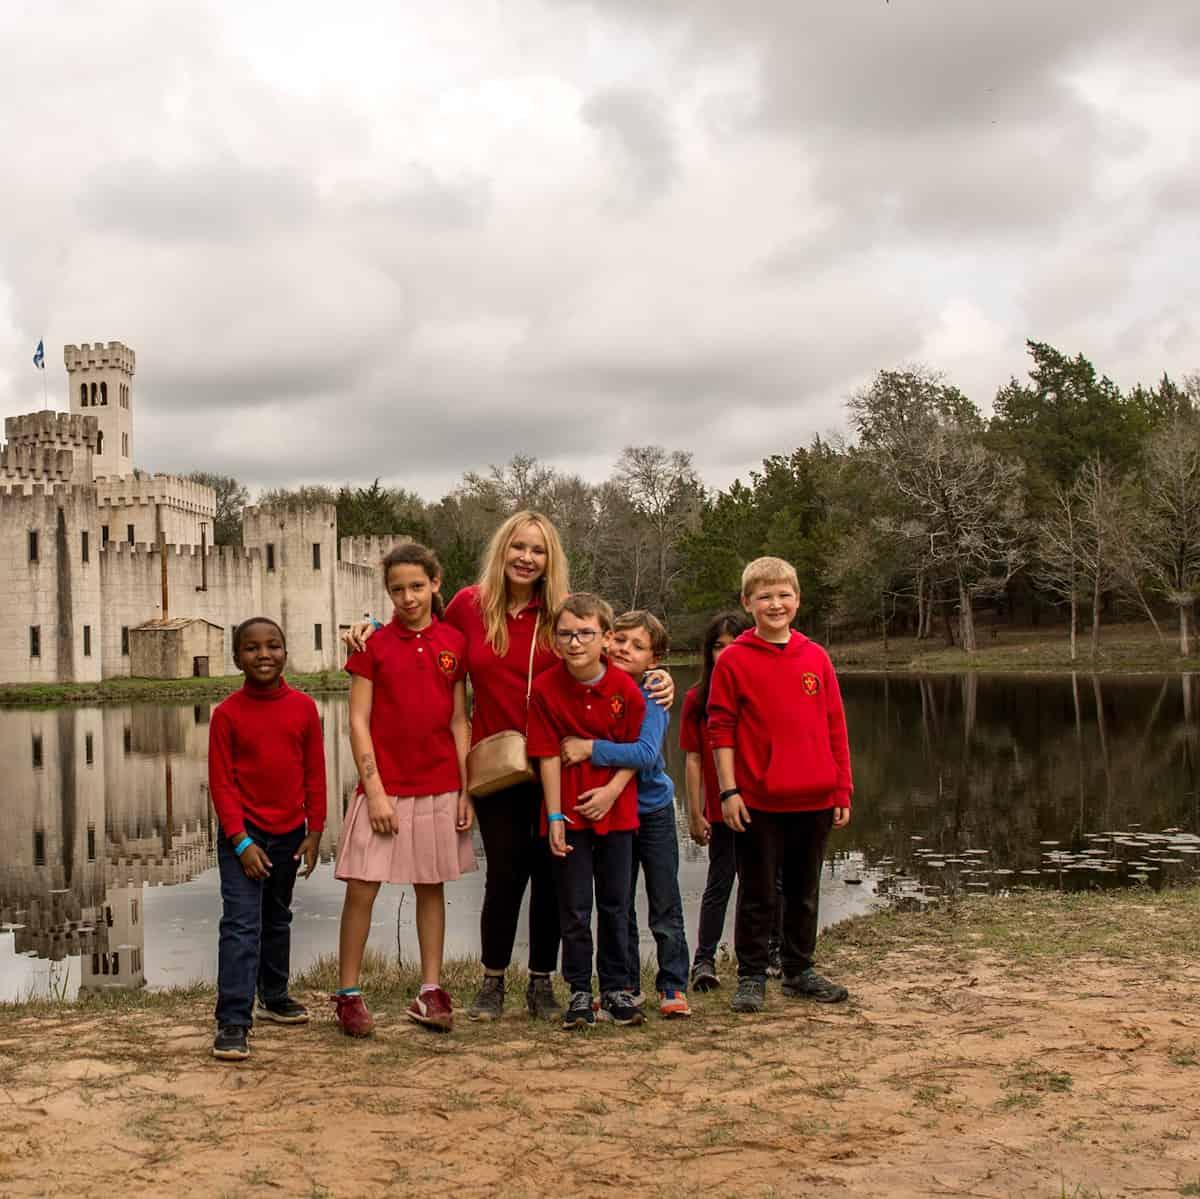 Rainard School Students on Field Trip